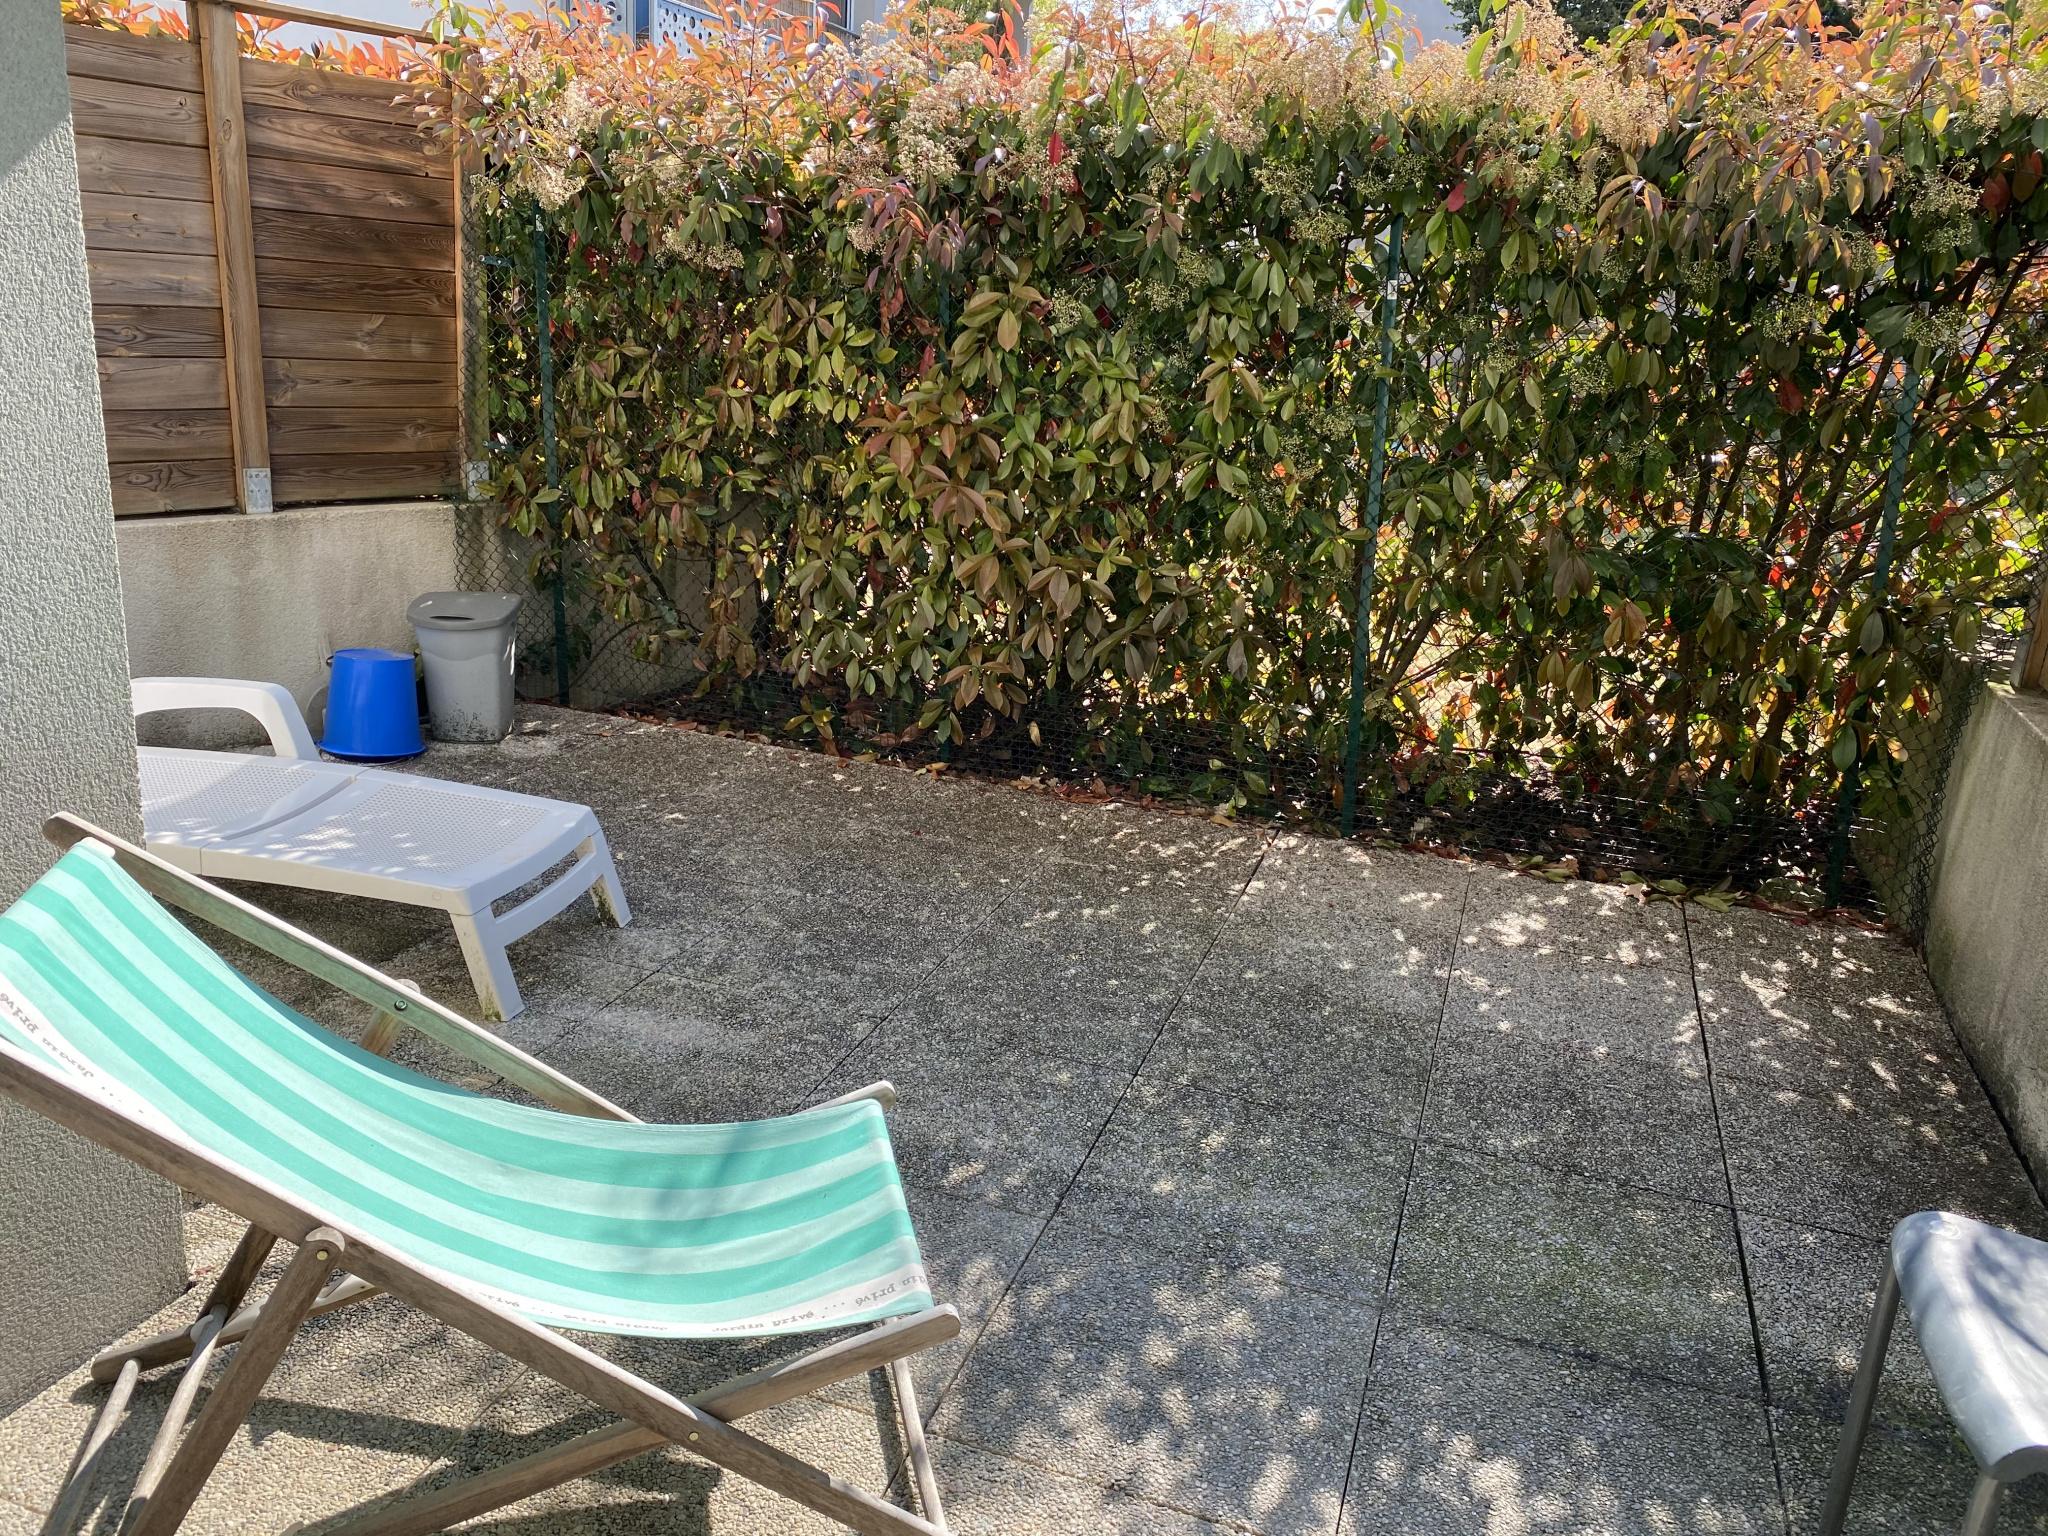 appartement la rochelle LA ROCHELLE - APPARTEMENT TYPE 2 AVEC TERRASSE